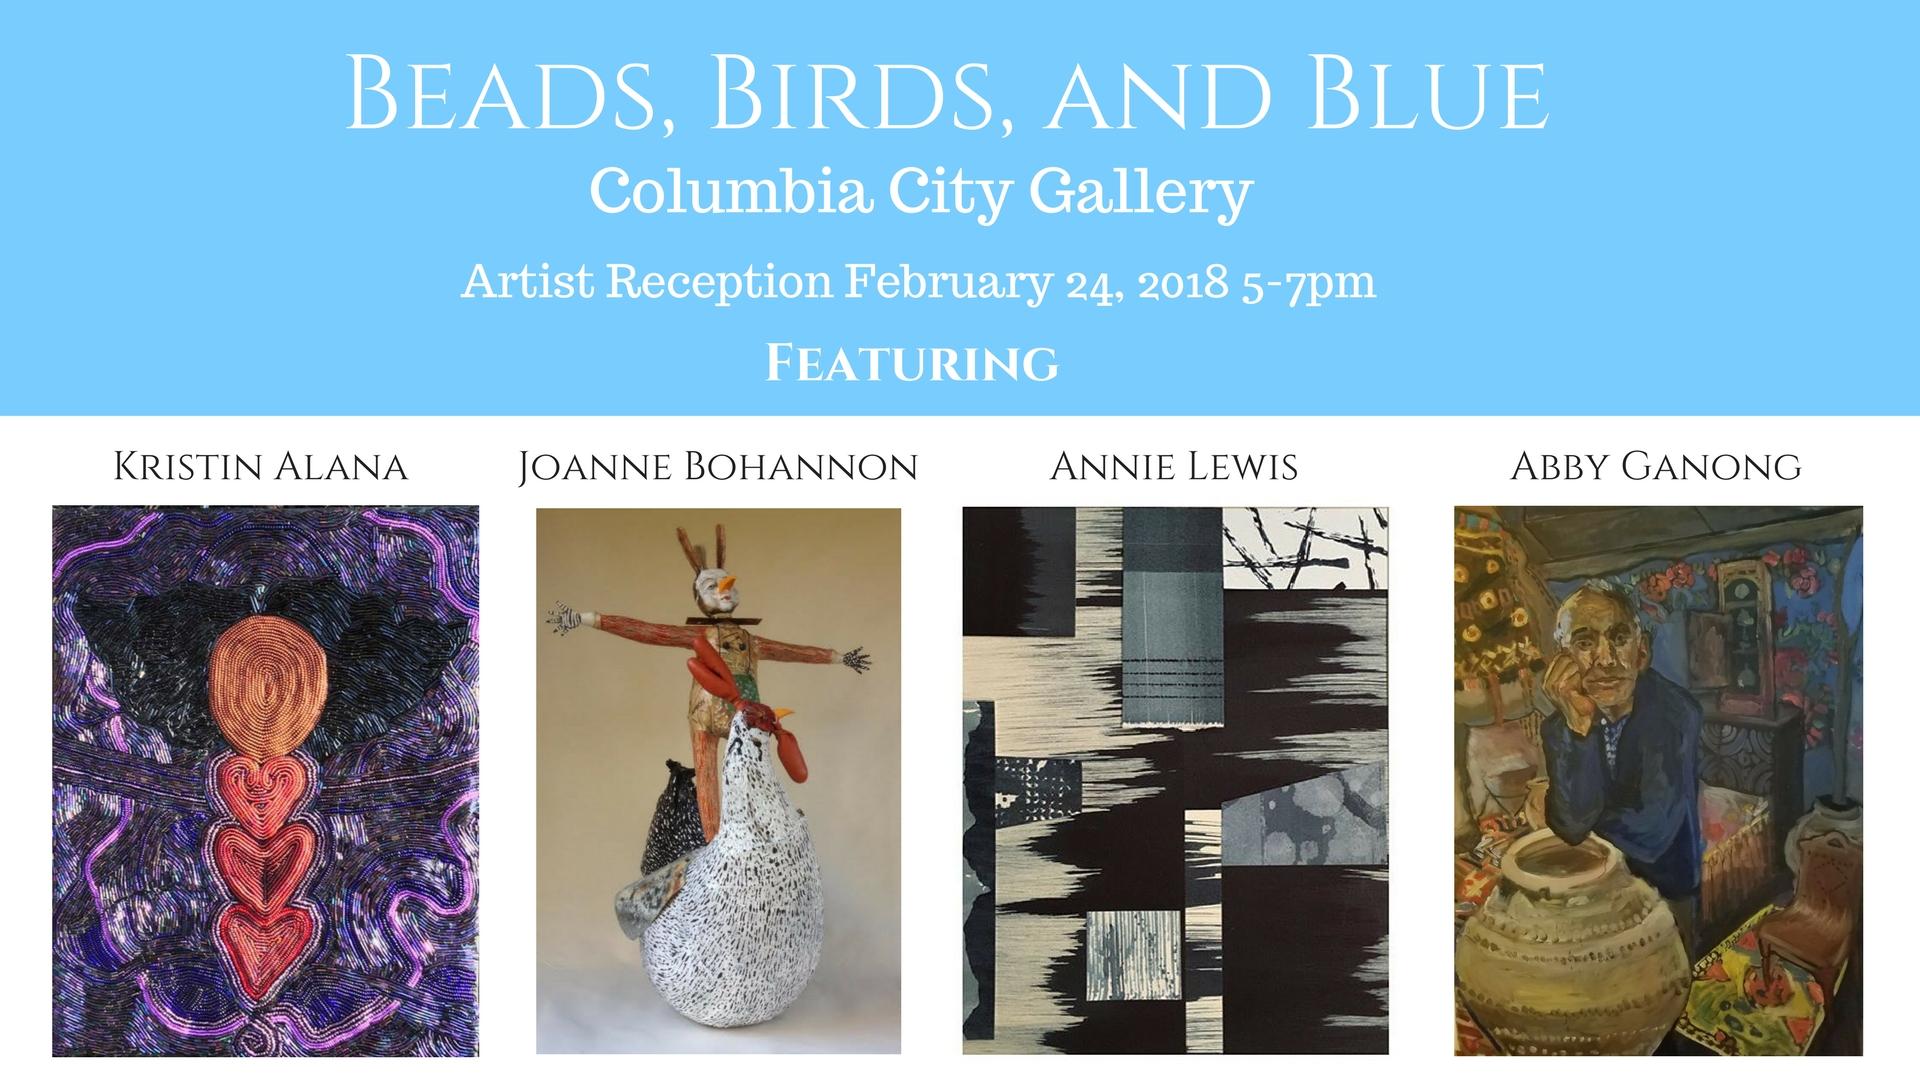 Beads, Birds, and Blue3.jpg